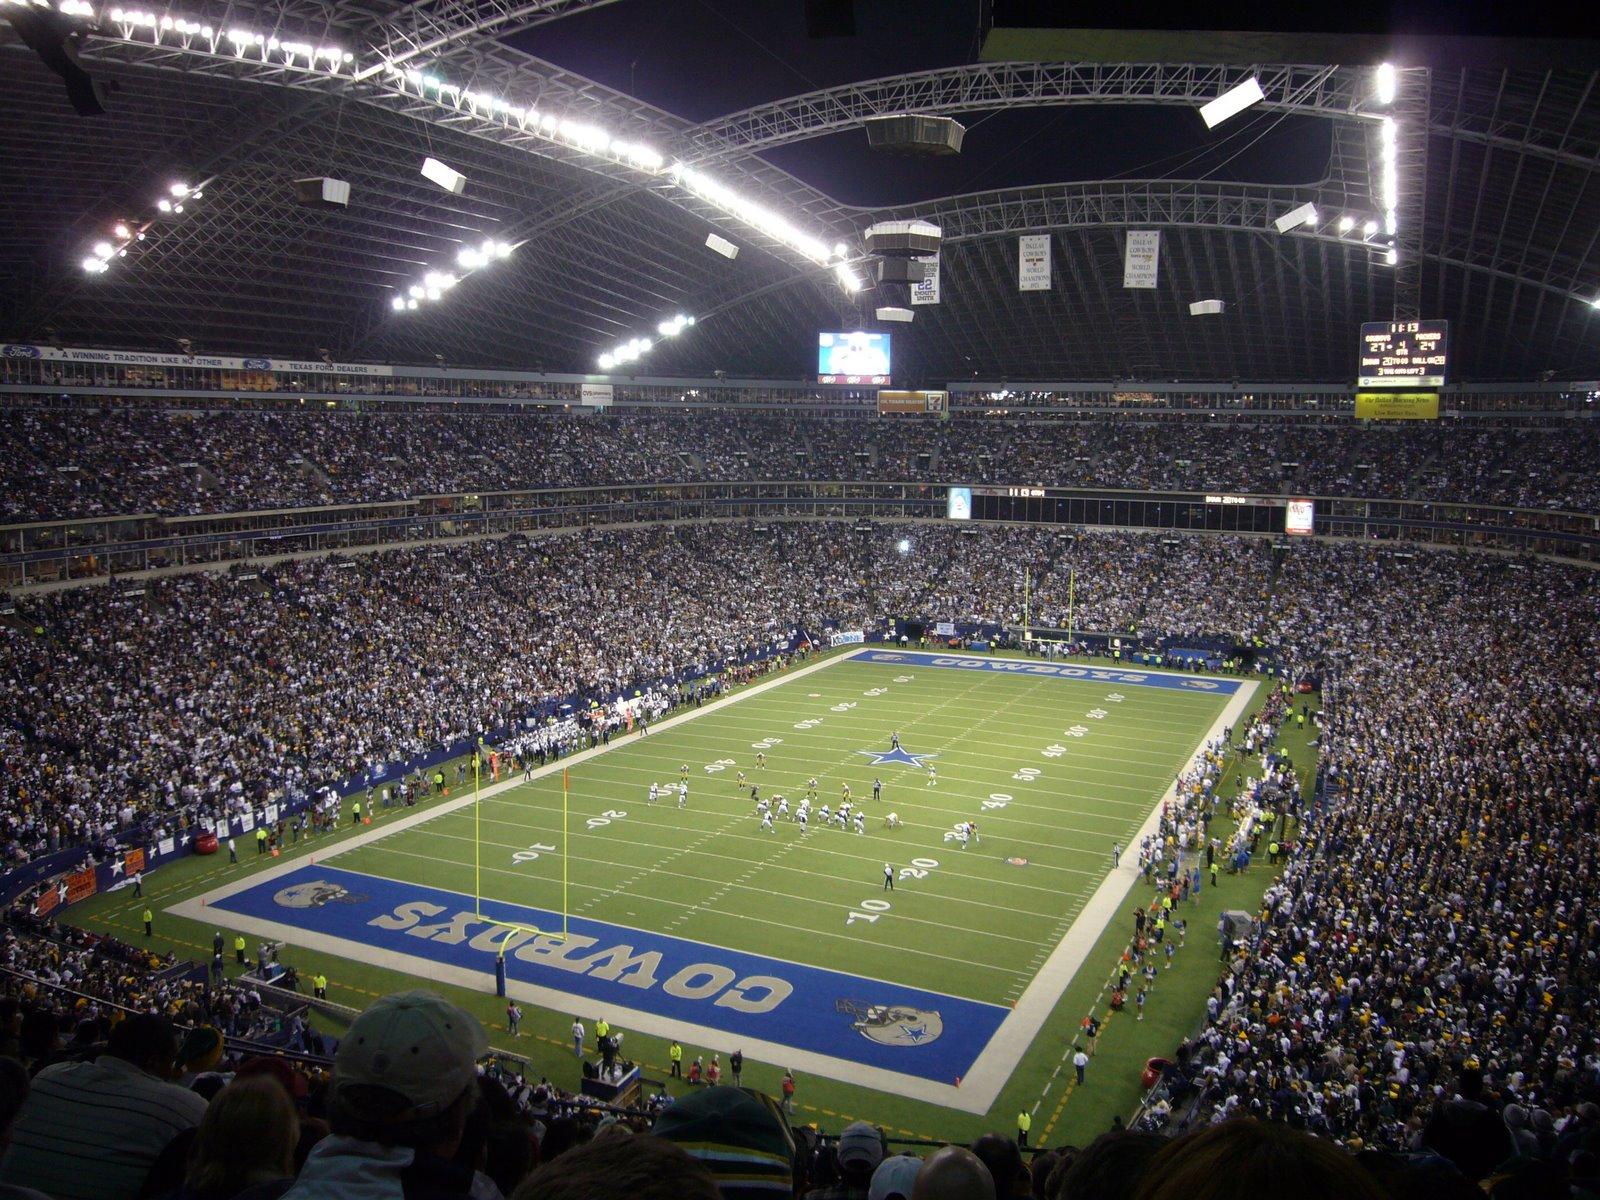 Dallas Cowboys Hd Wallpaper - Texas Stadium - HD Wallpaper